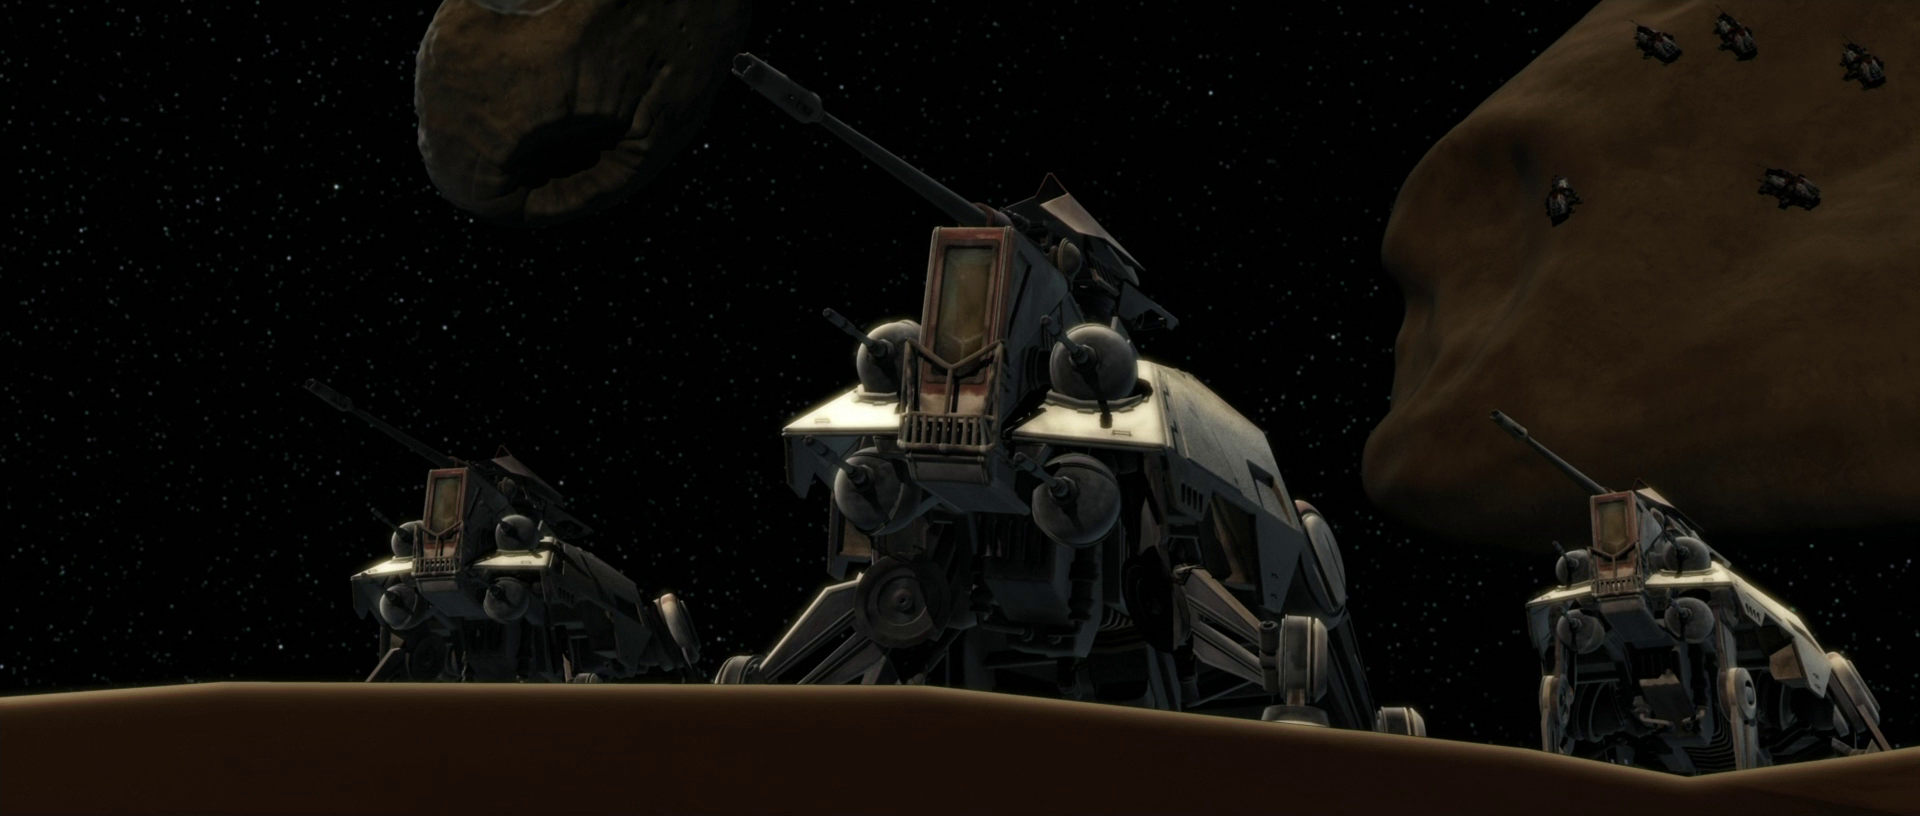 star wars AT TE missile du canon principal